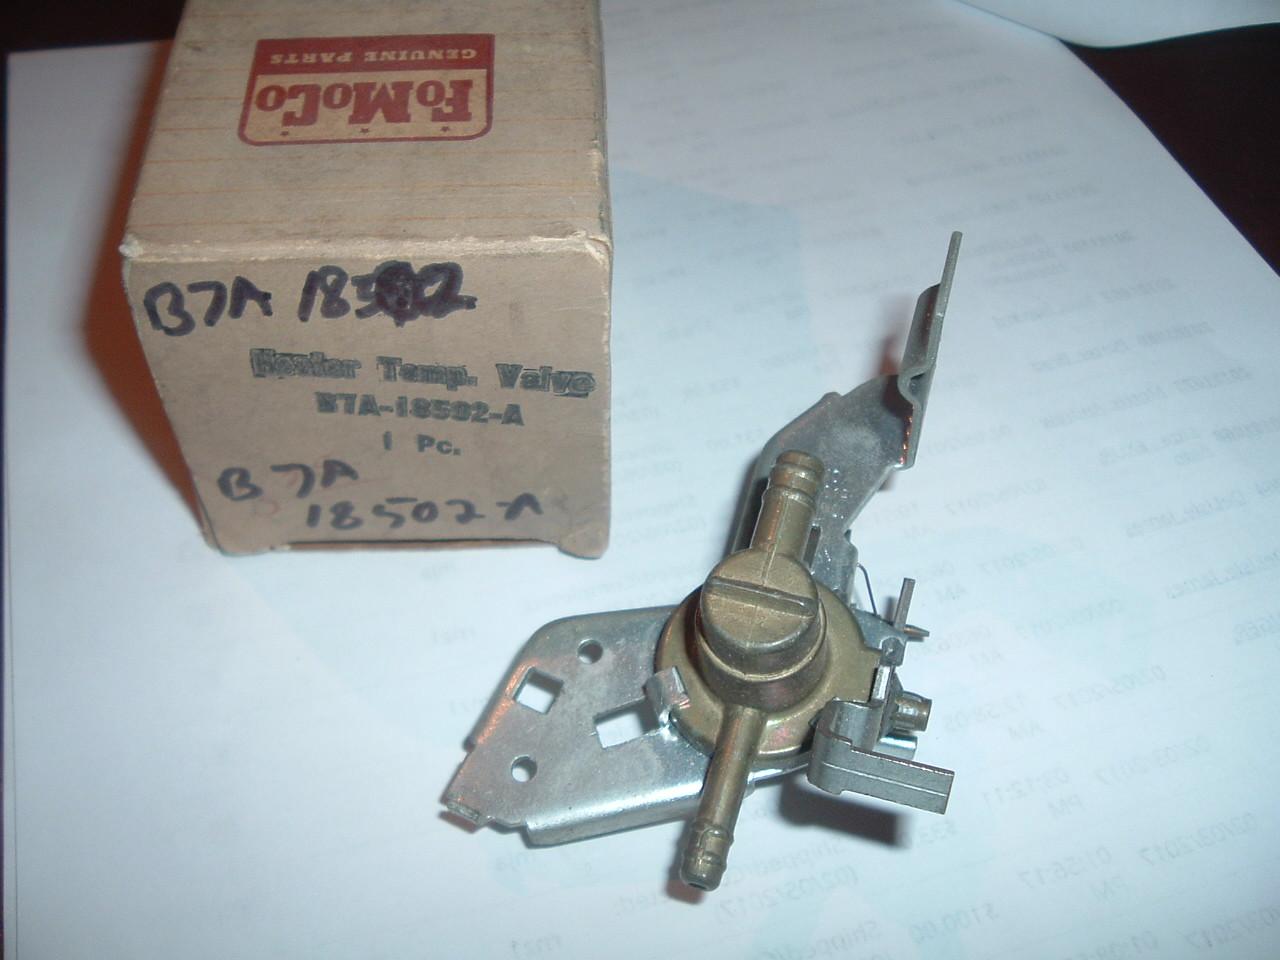 1957 58 59 60 Ford & Thunderbird heater sensing unit nos ford B7A-18502-A (z b7a18502a)